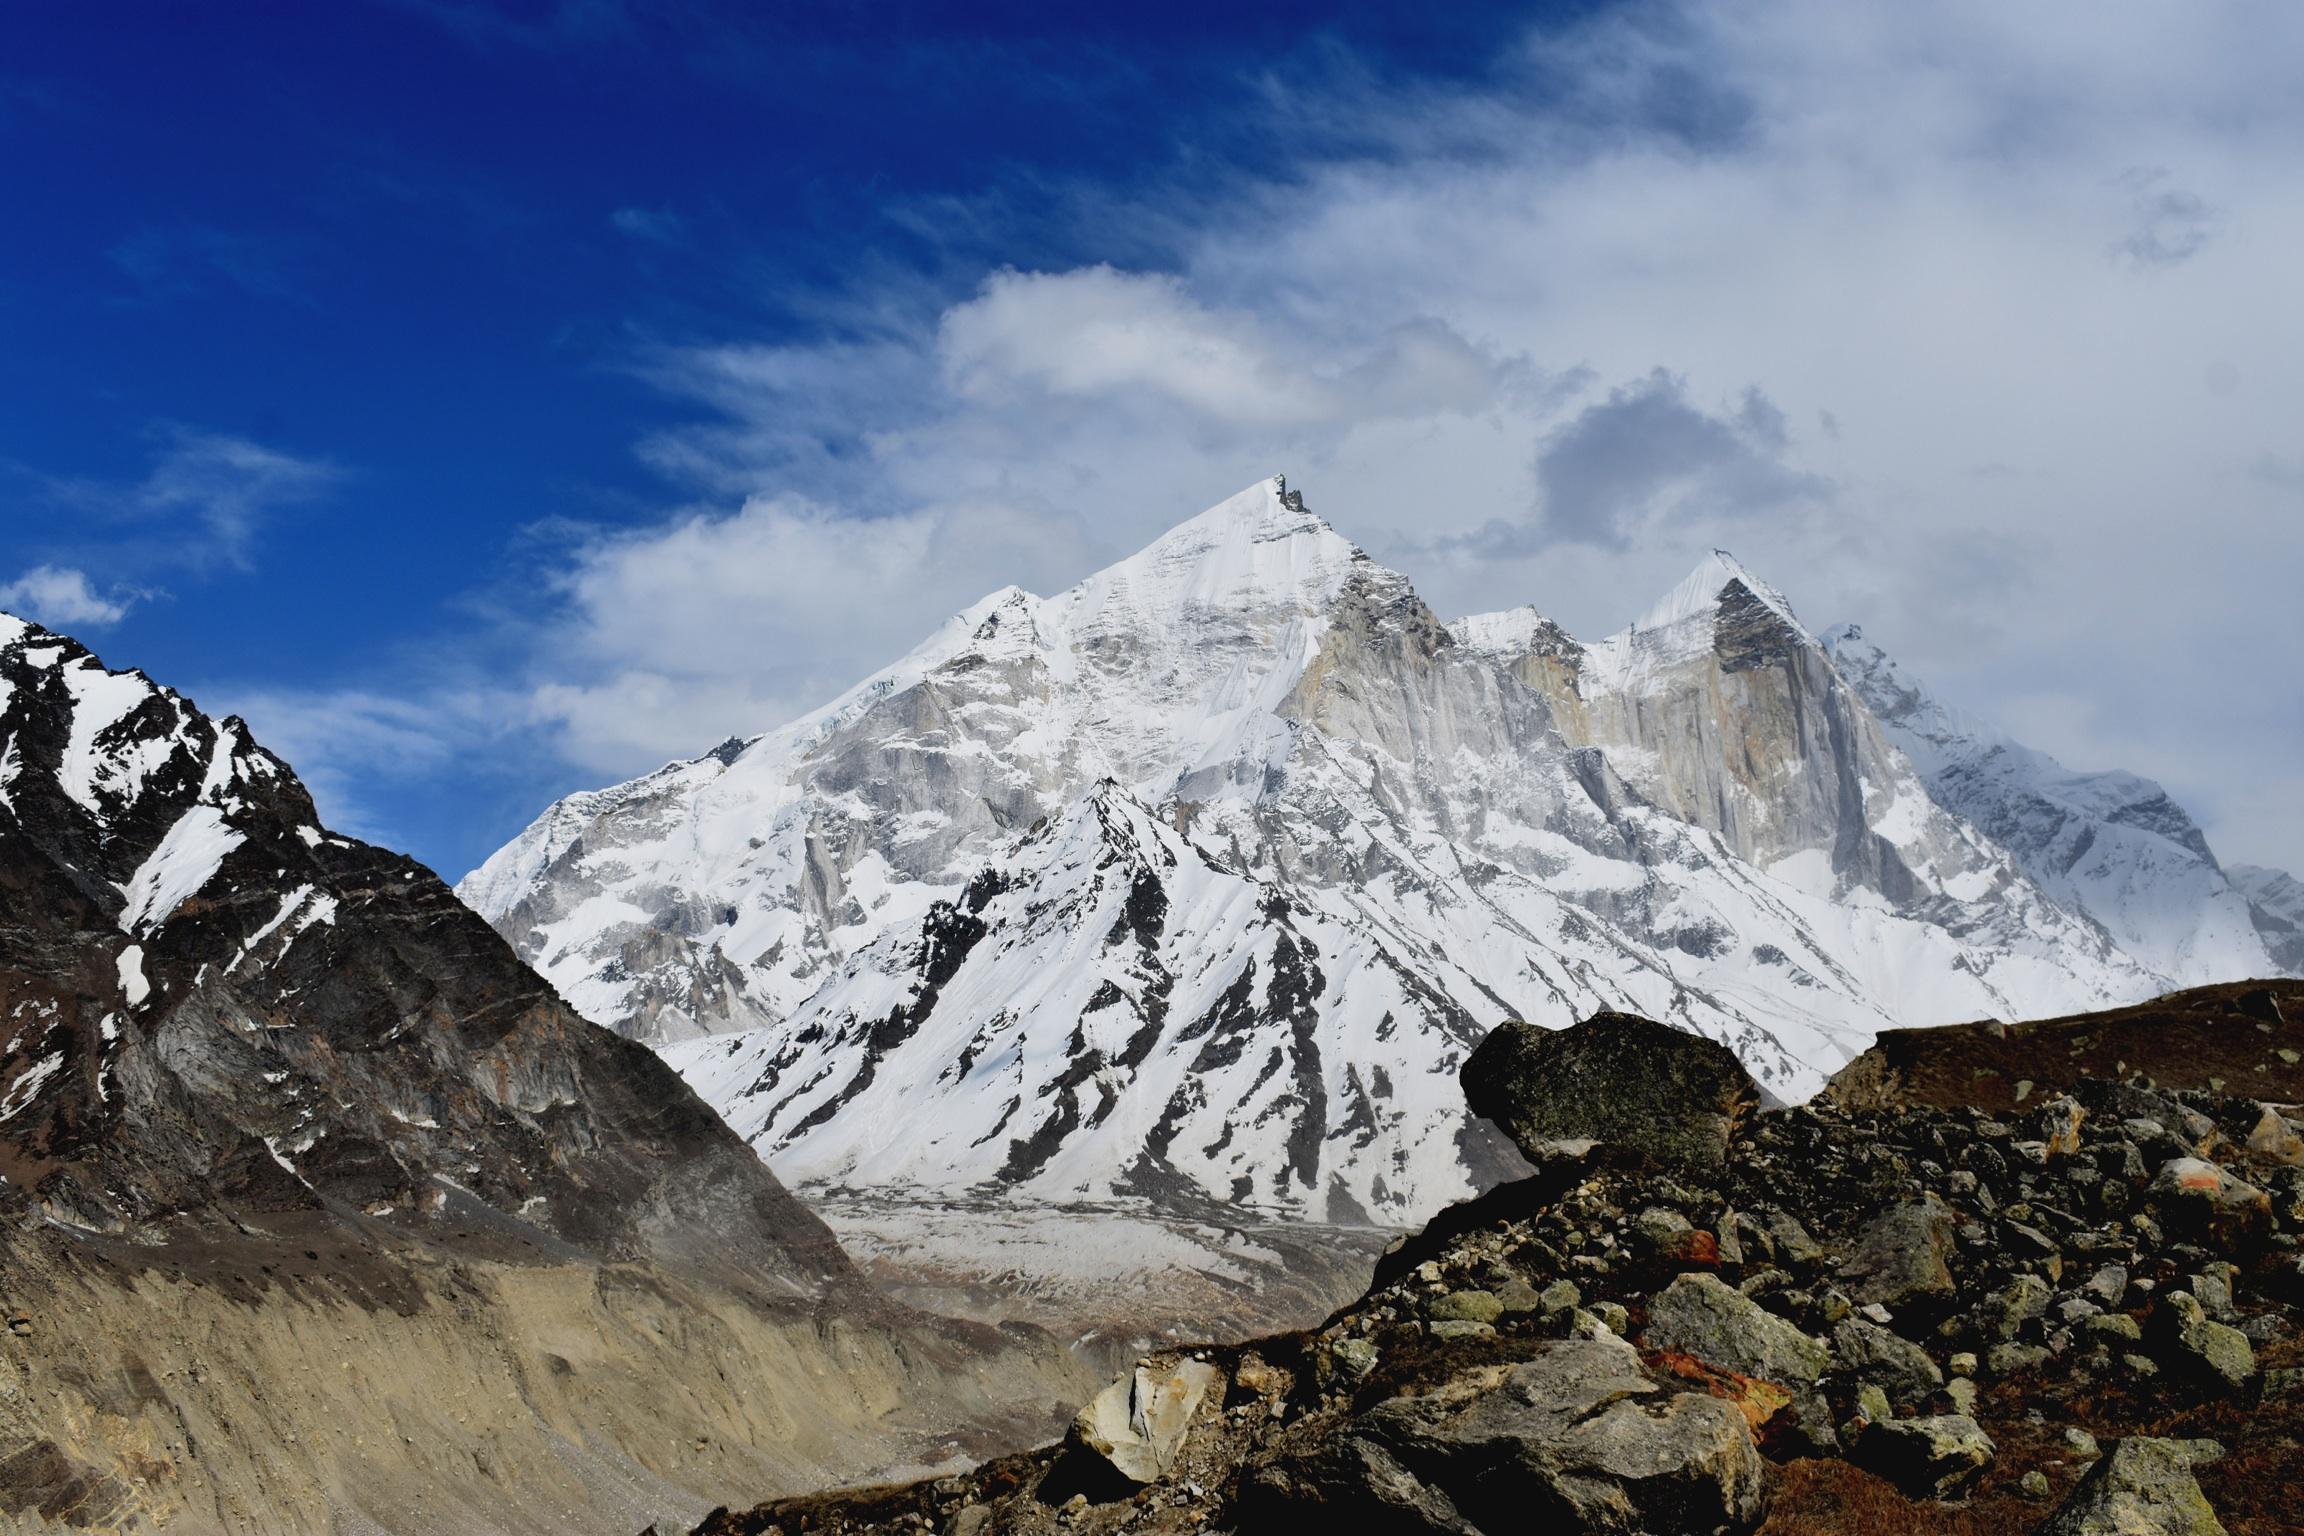 Snowy mountains of Himalaya